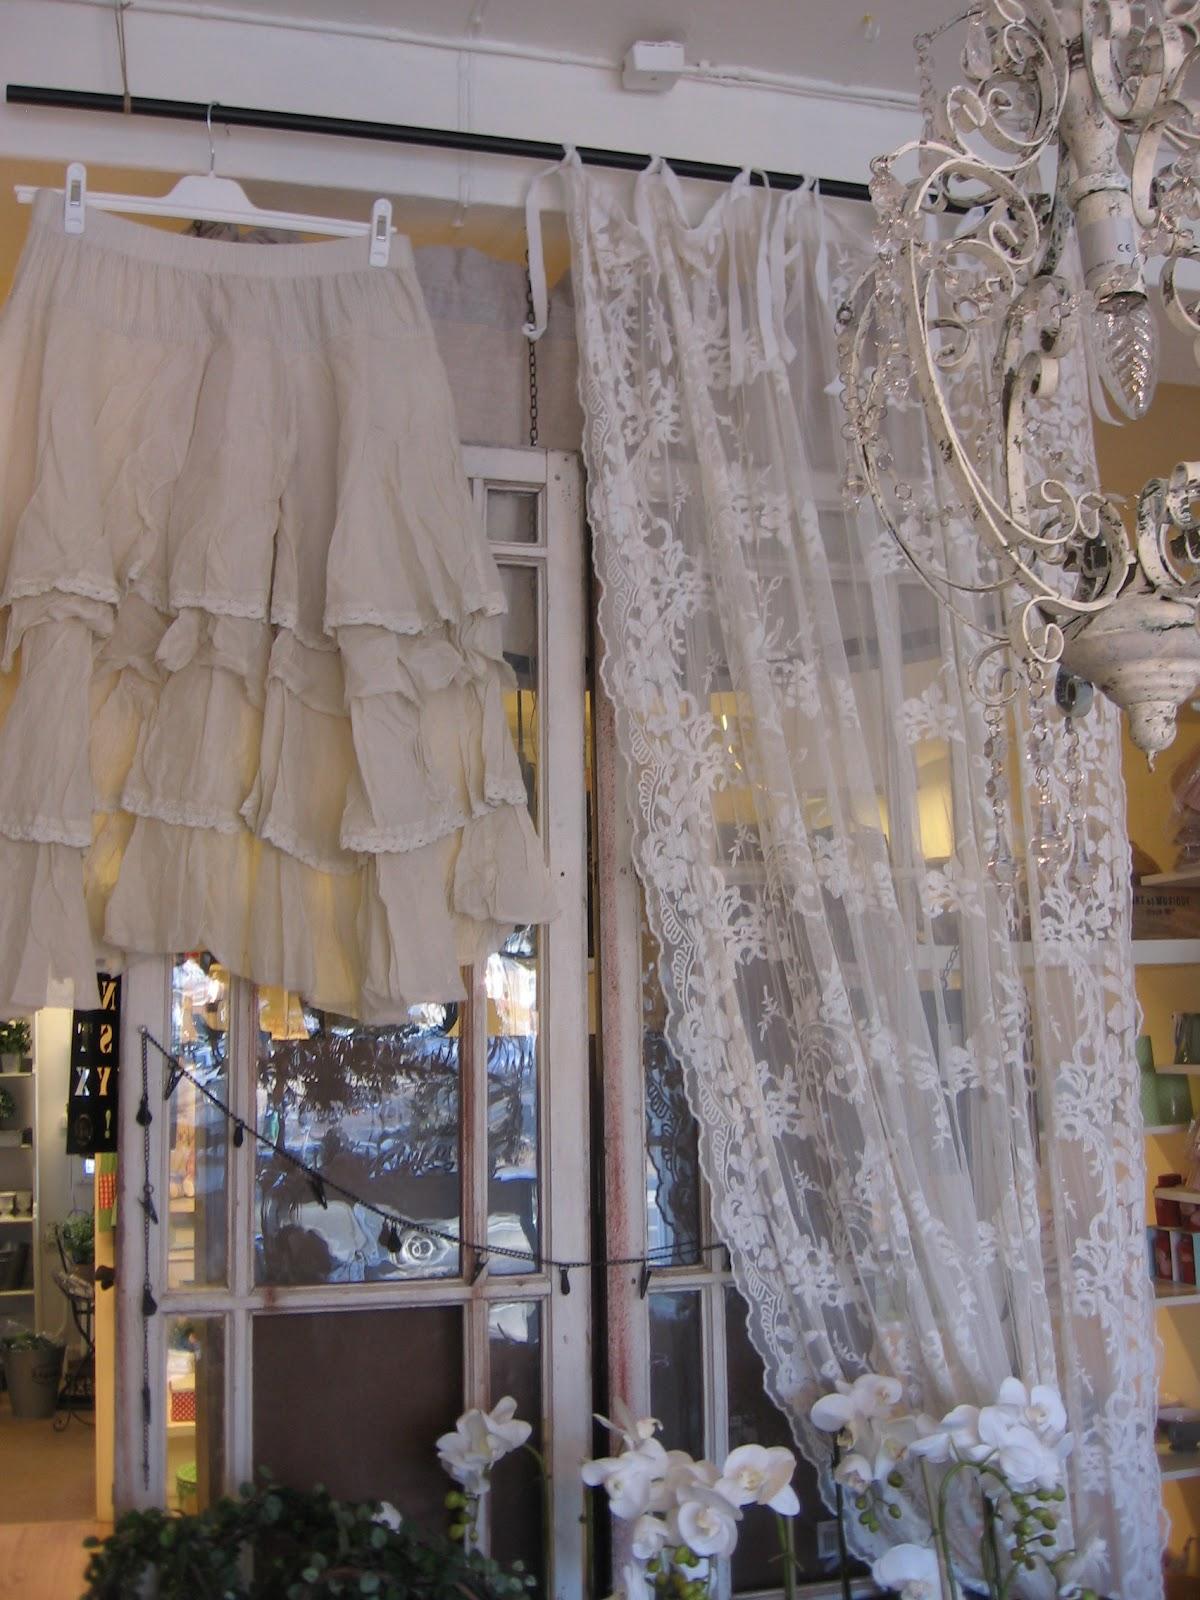 lene bjerre gardiner Lene bjerre gardiner tilbud – Design et barns værelse lene bjerre gardiner